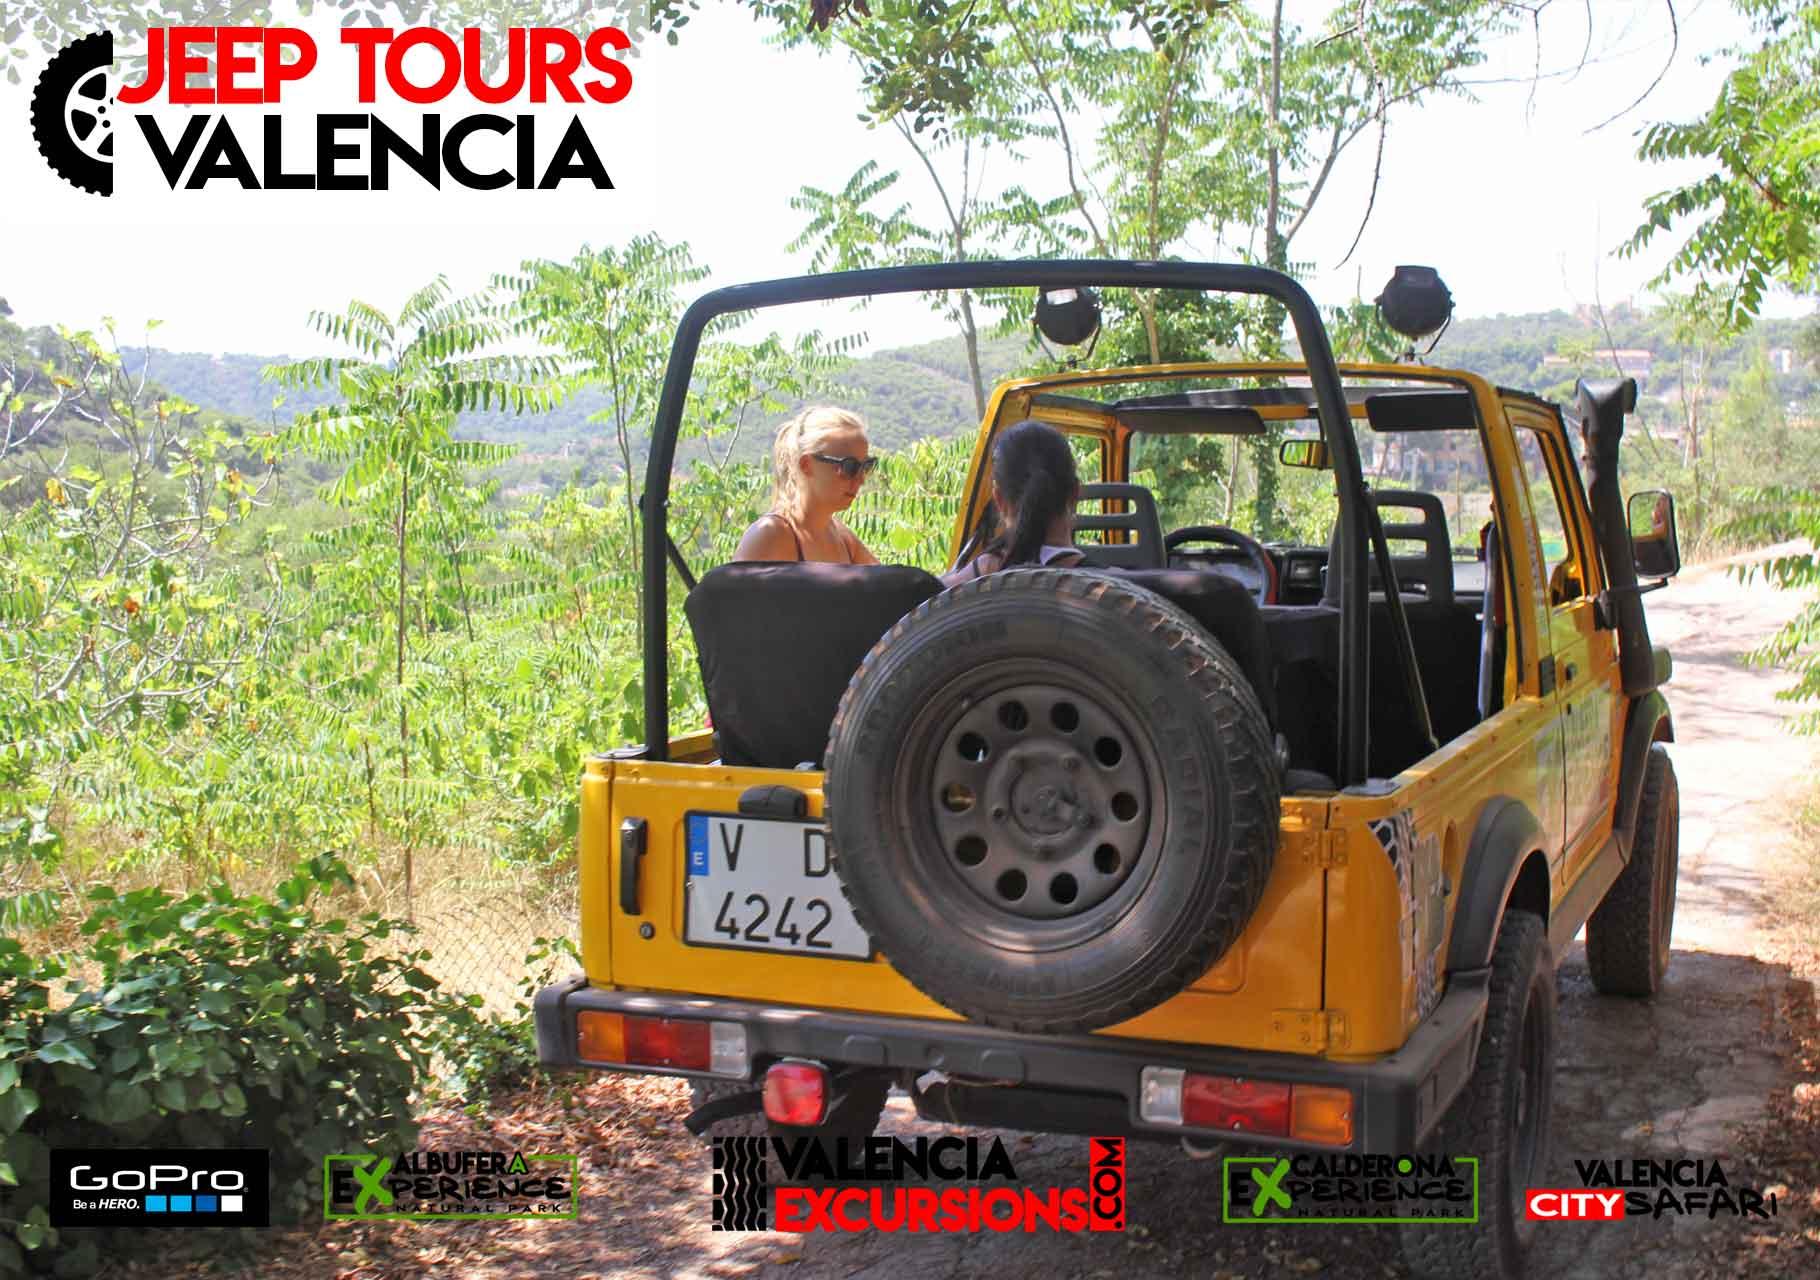 Valencia Excursions jeep tour